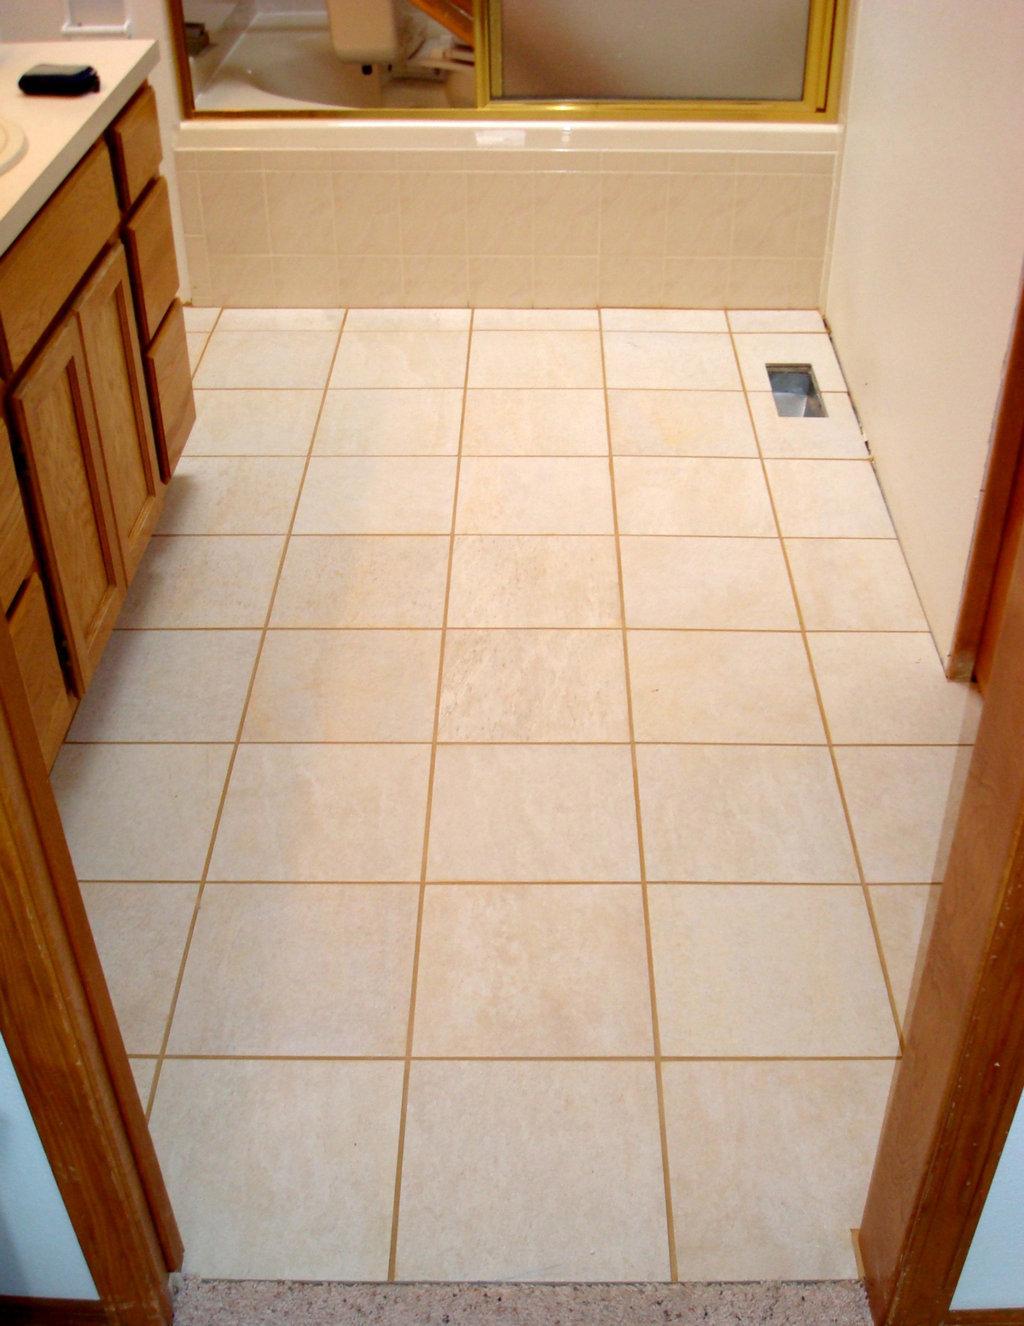 Ceramic Tile Floor Patterns Designs: Ceramic Tile Flooring For Your Homes